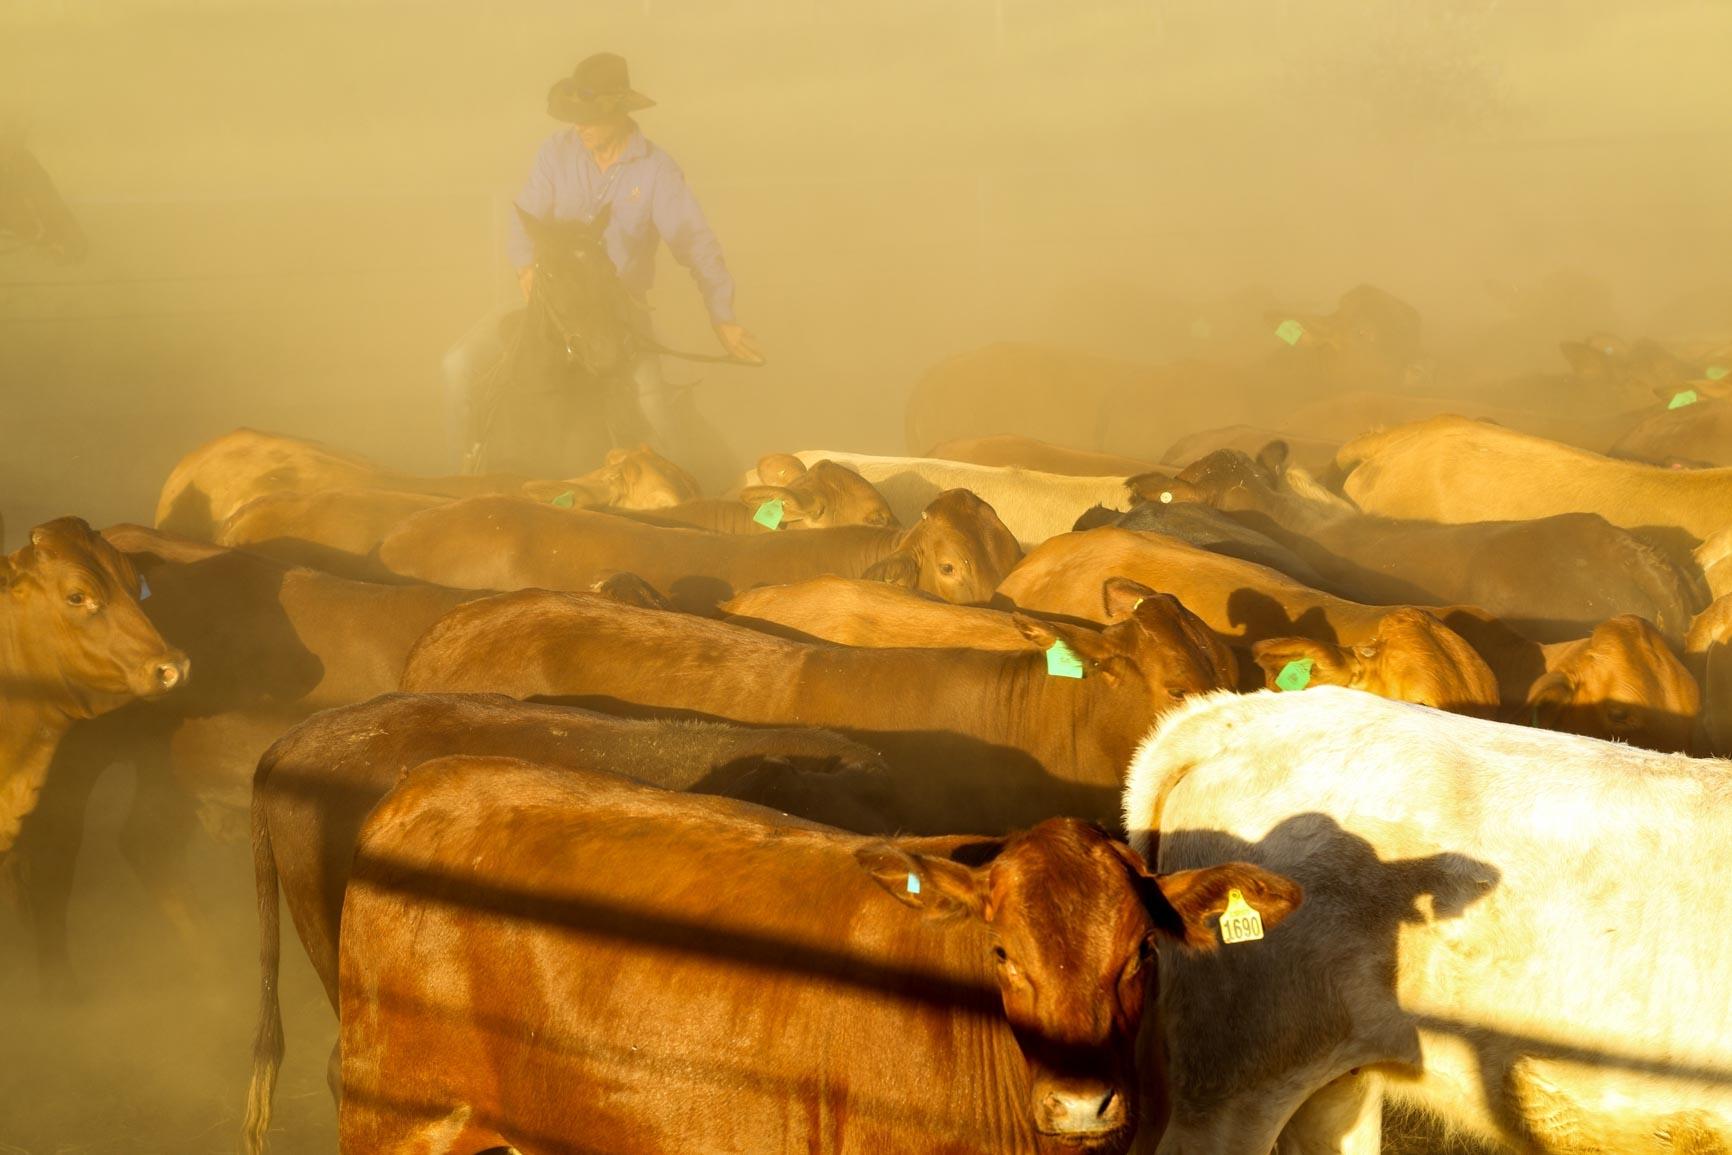 Man wearing cowboy hat on horse herding  cows